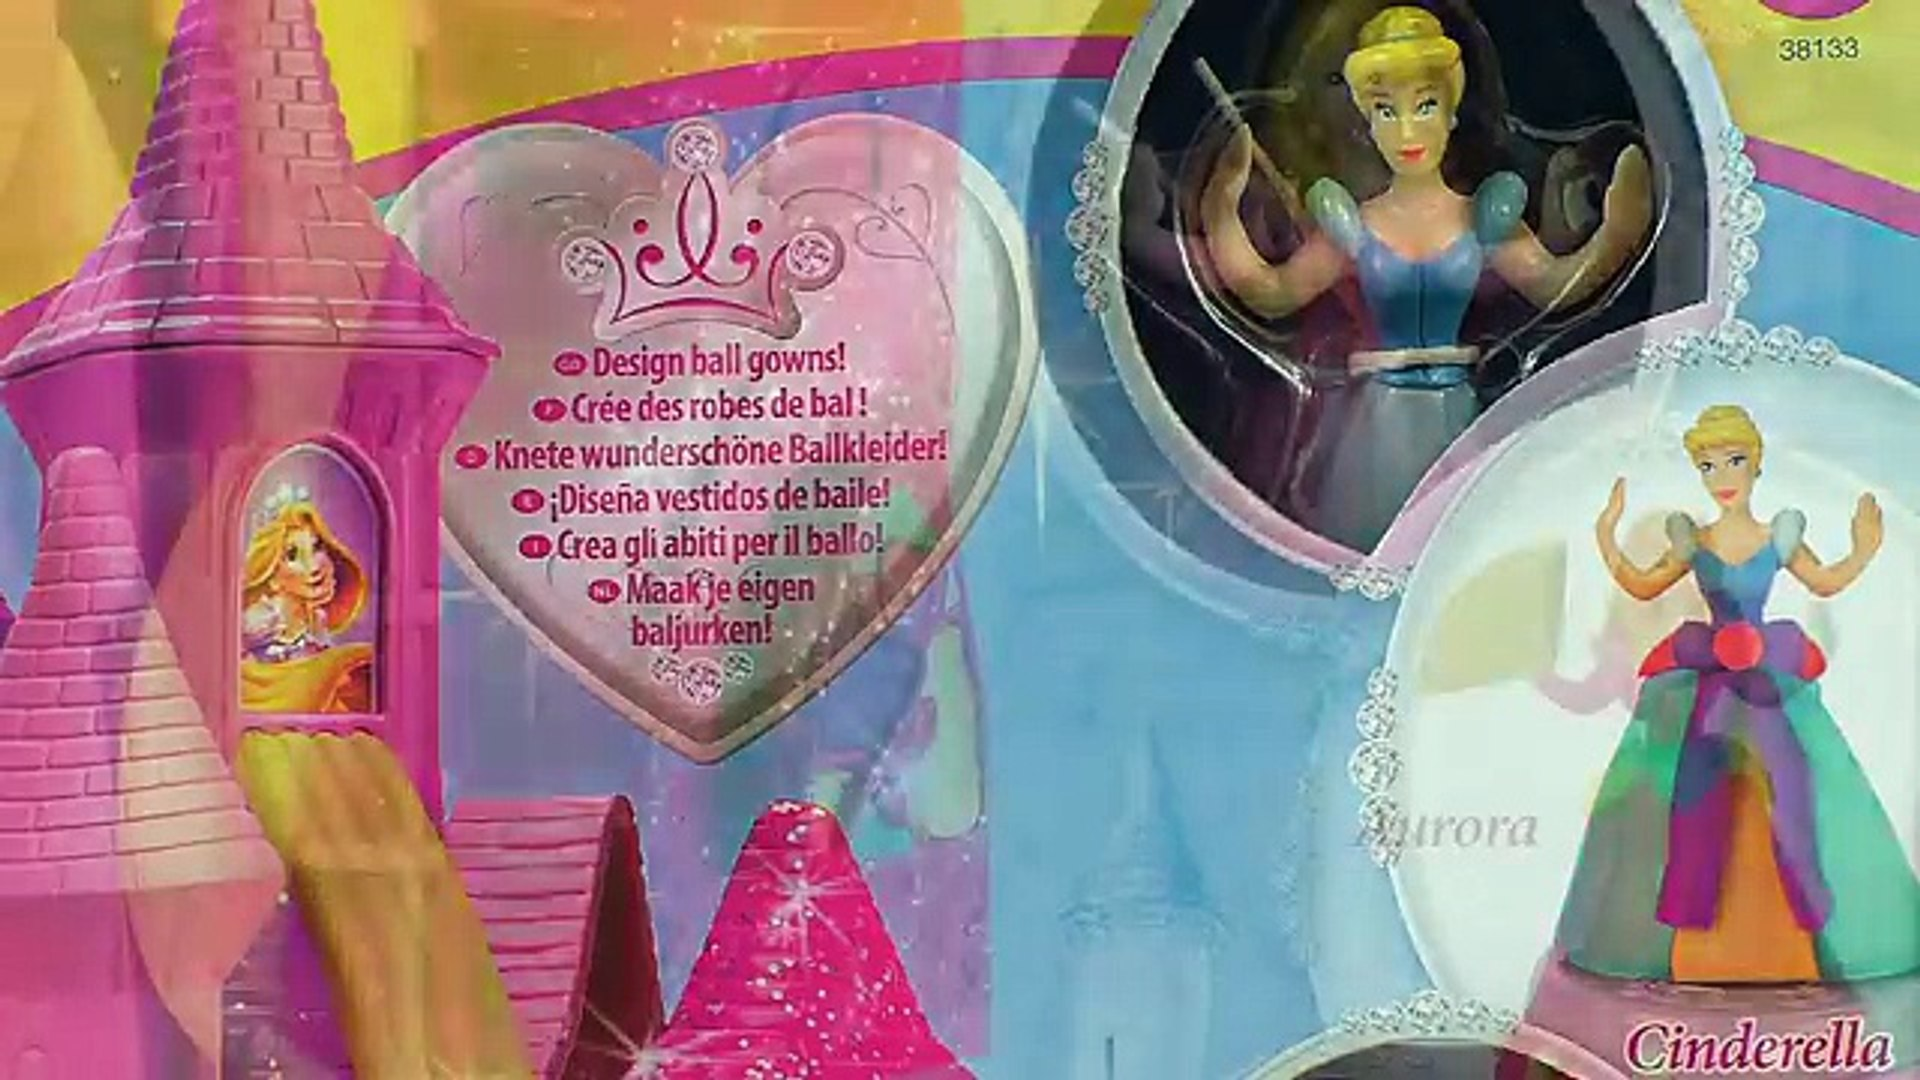 Play Doh Disney Prettiest Princess Castle Cinderella Aurora Belle Girl Barbie Games Toys Playsets